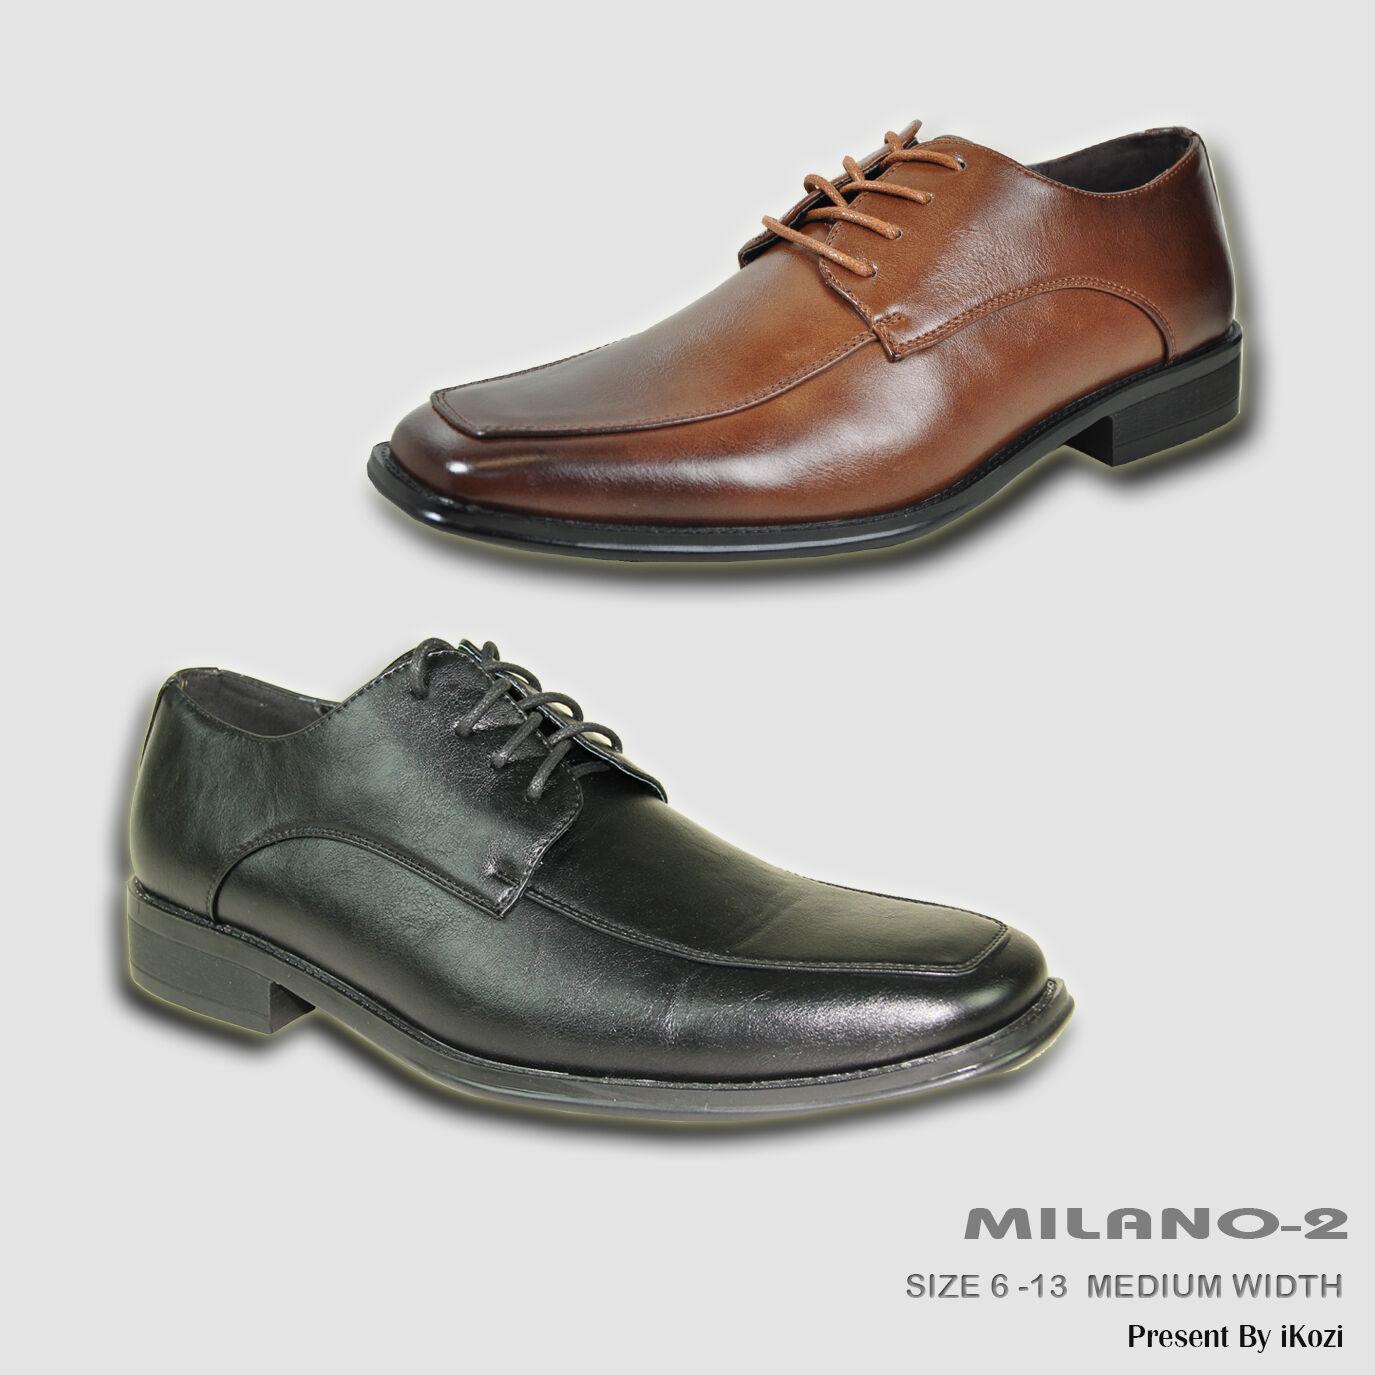 BRAVO New Men Dress shoes MILANO-2 Classic Oxford Square Moe Toe Leather Lining